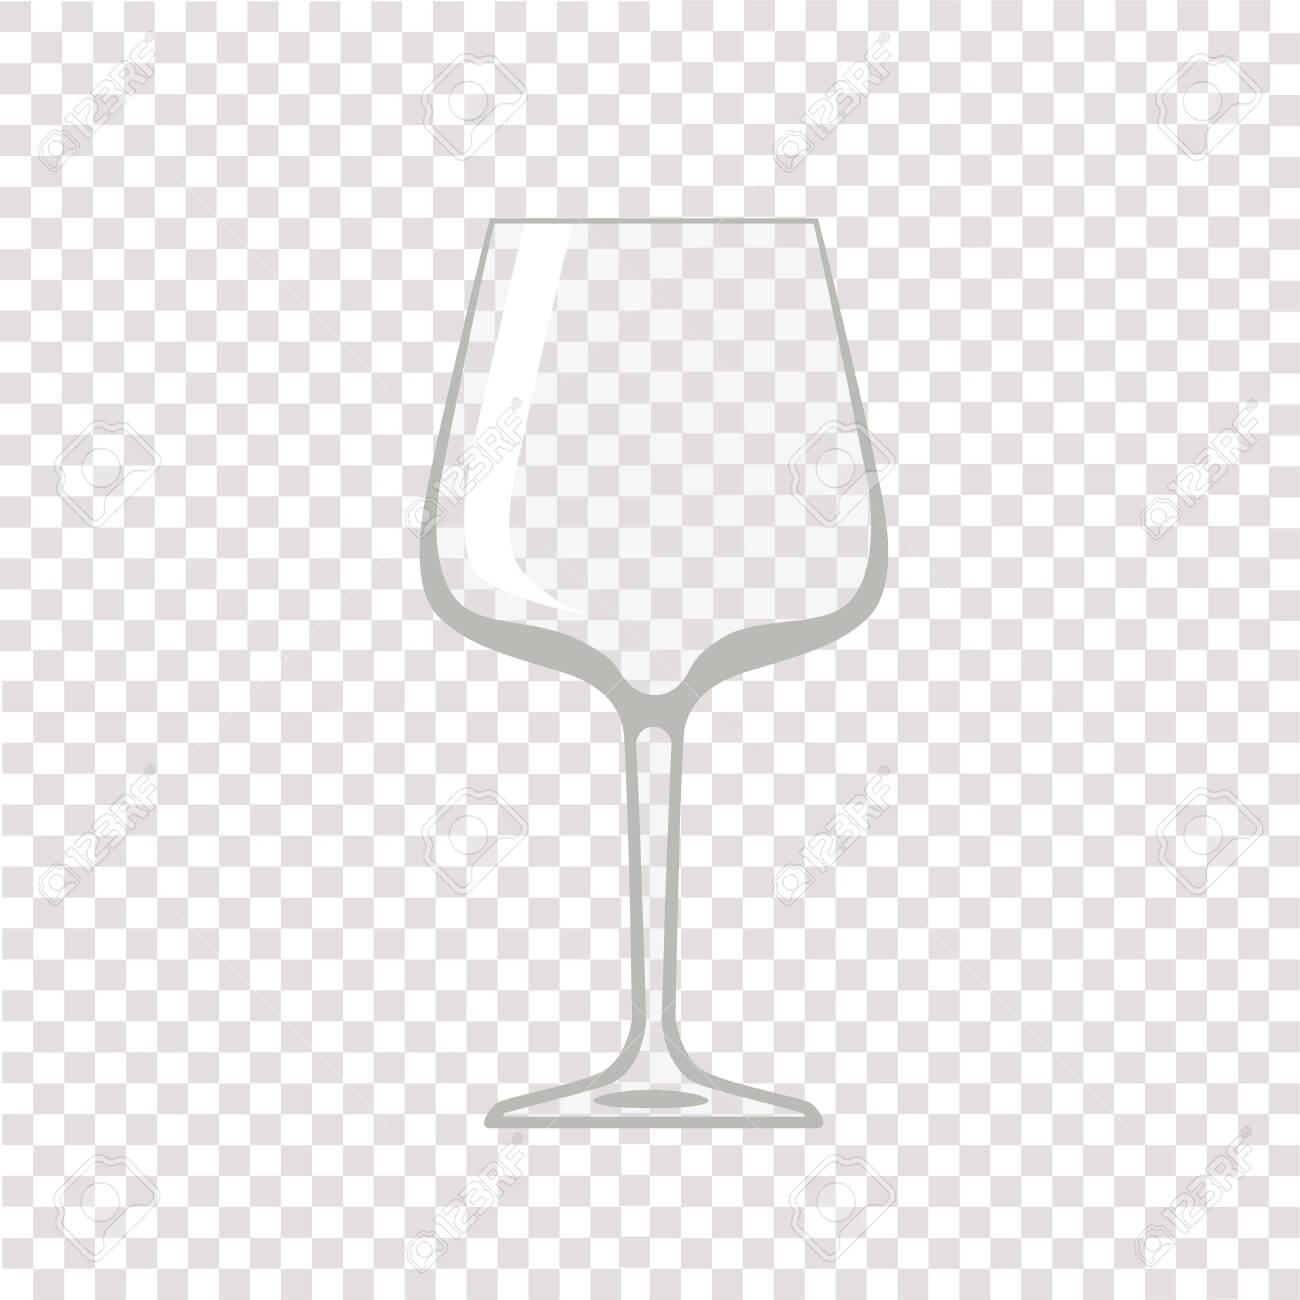 Wine glass. Transparent empty wine glass. Vector illustration - 131232197